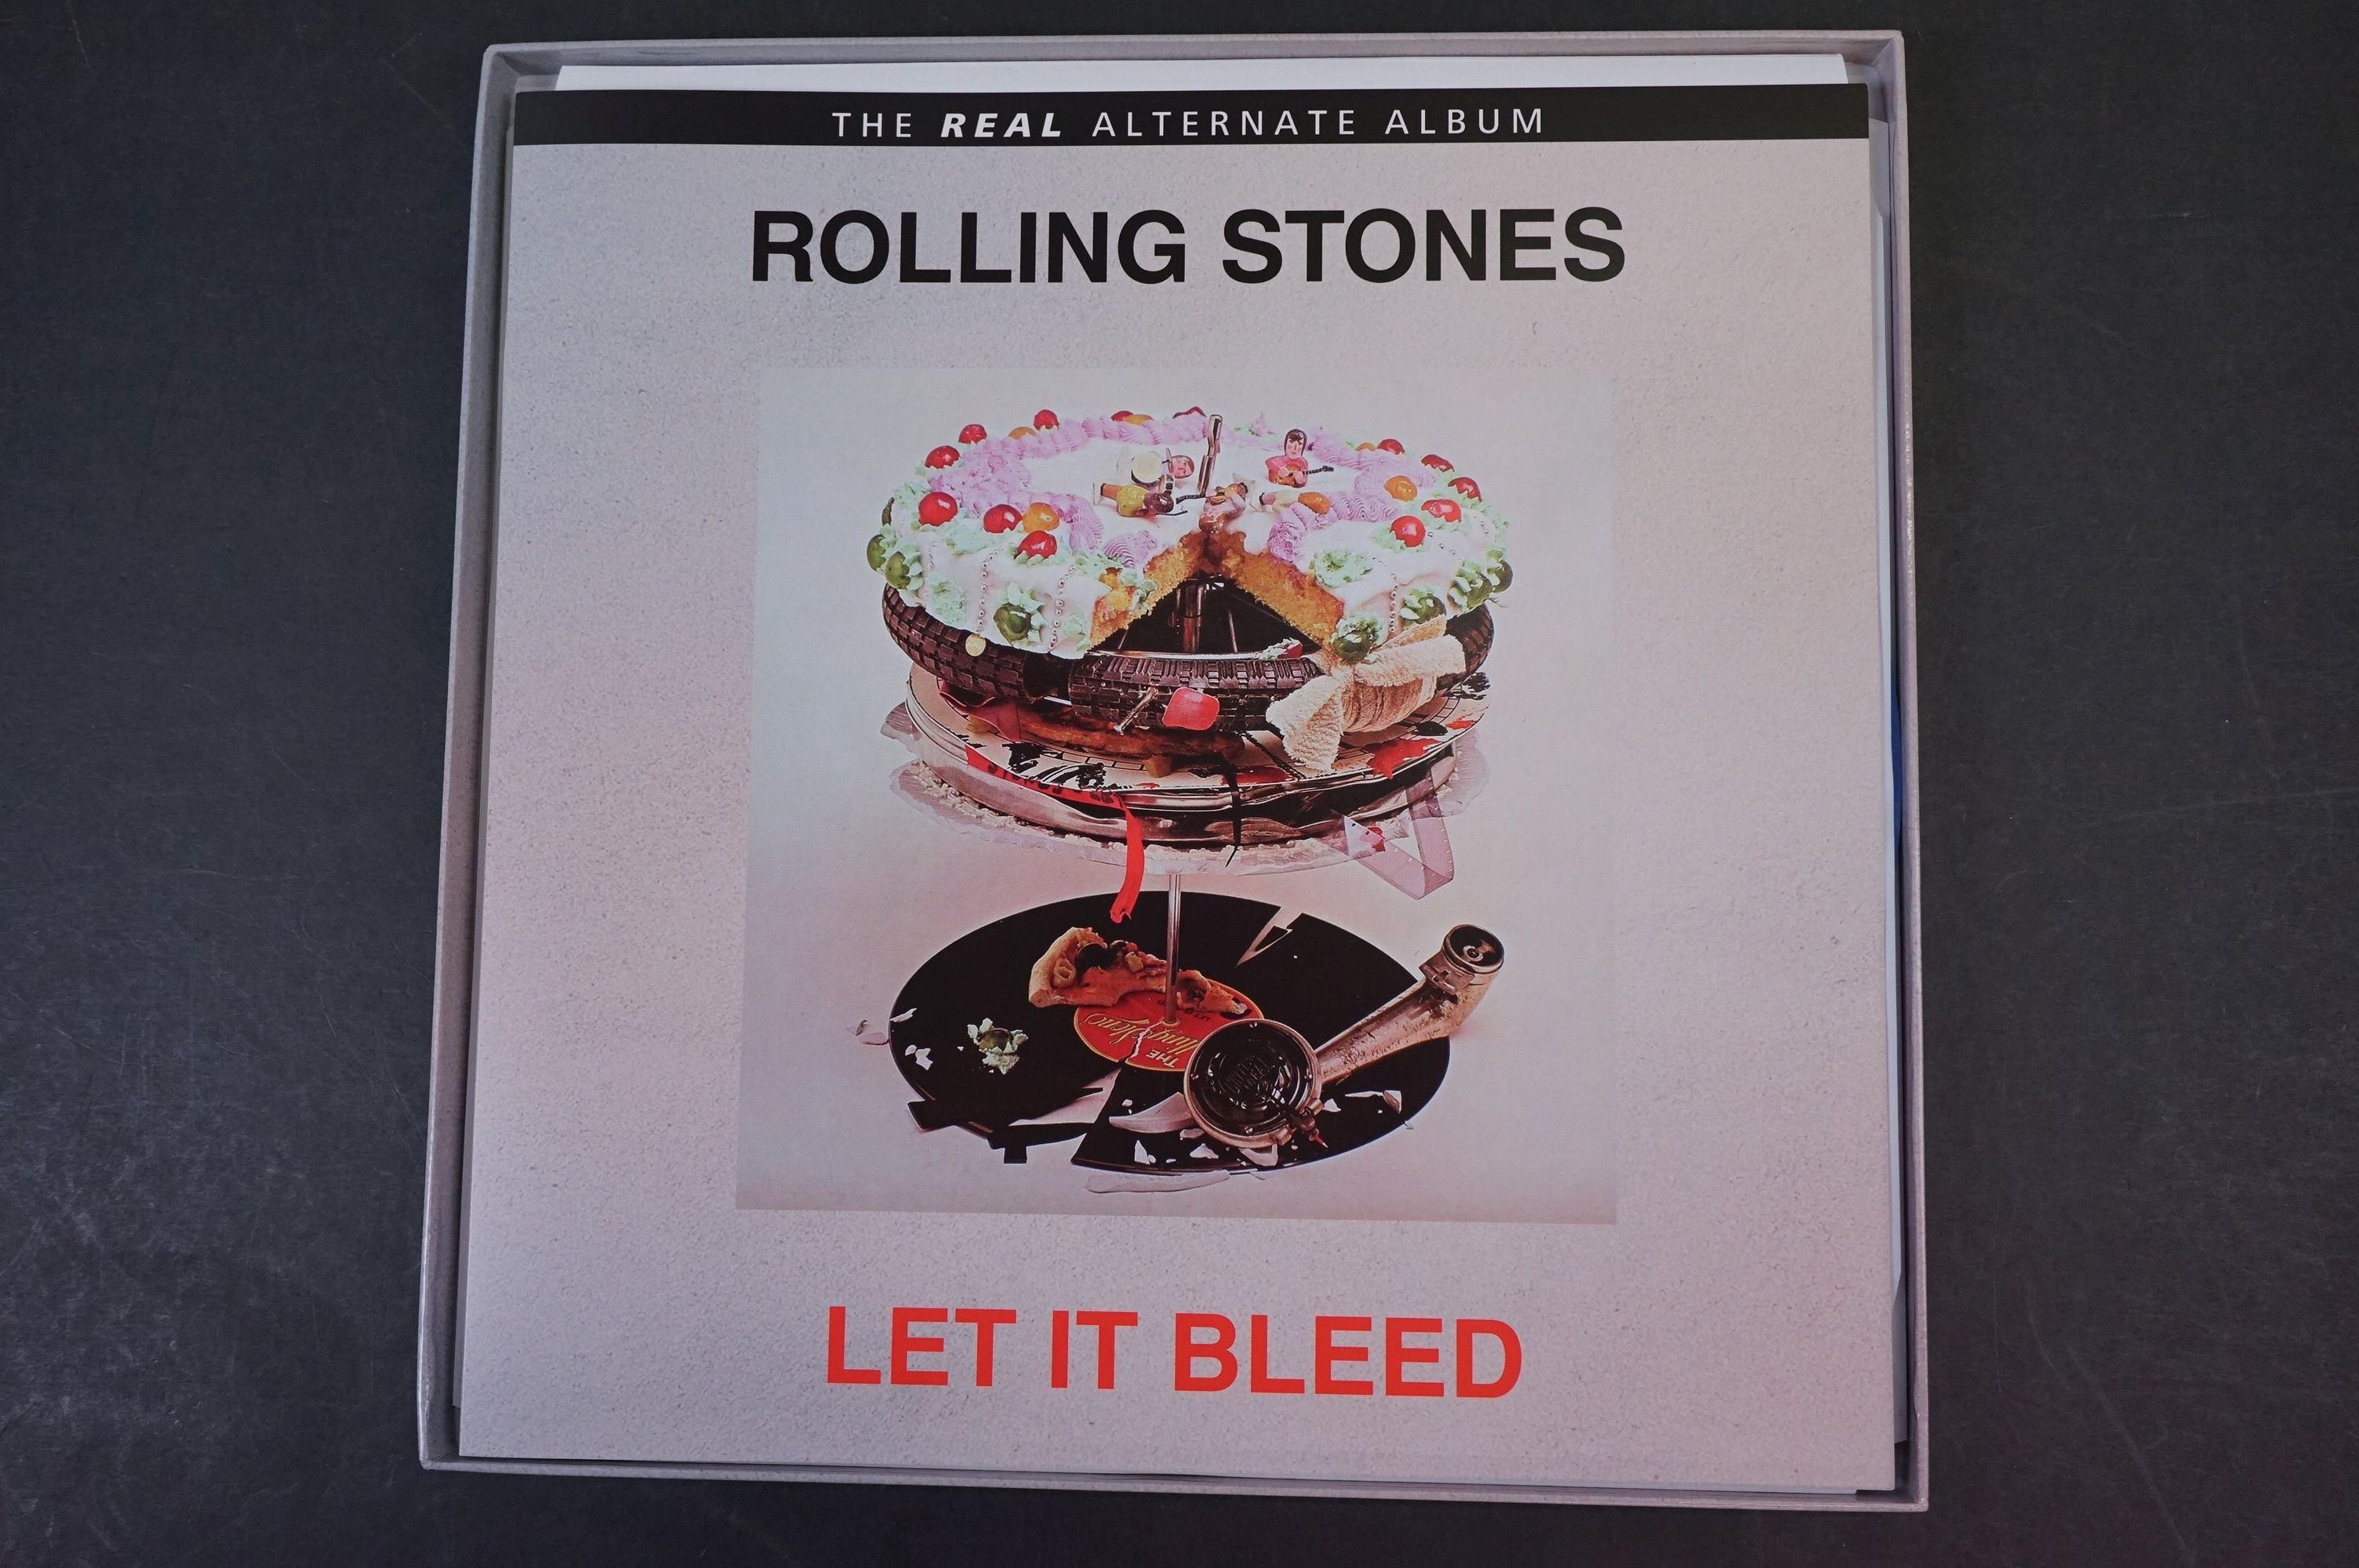 Vinyl - ltd edn The Real Alternate Album Rolling Stones Let It Bleed 3 LP / 2 CD Box Set RTR011, - Image 3 of 9